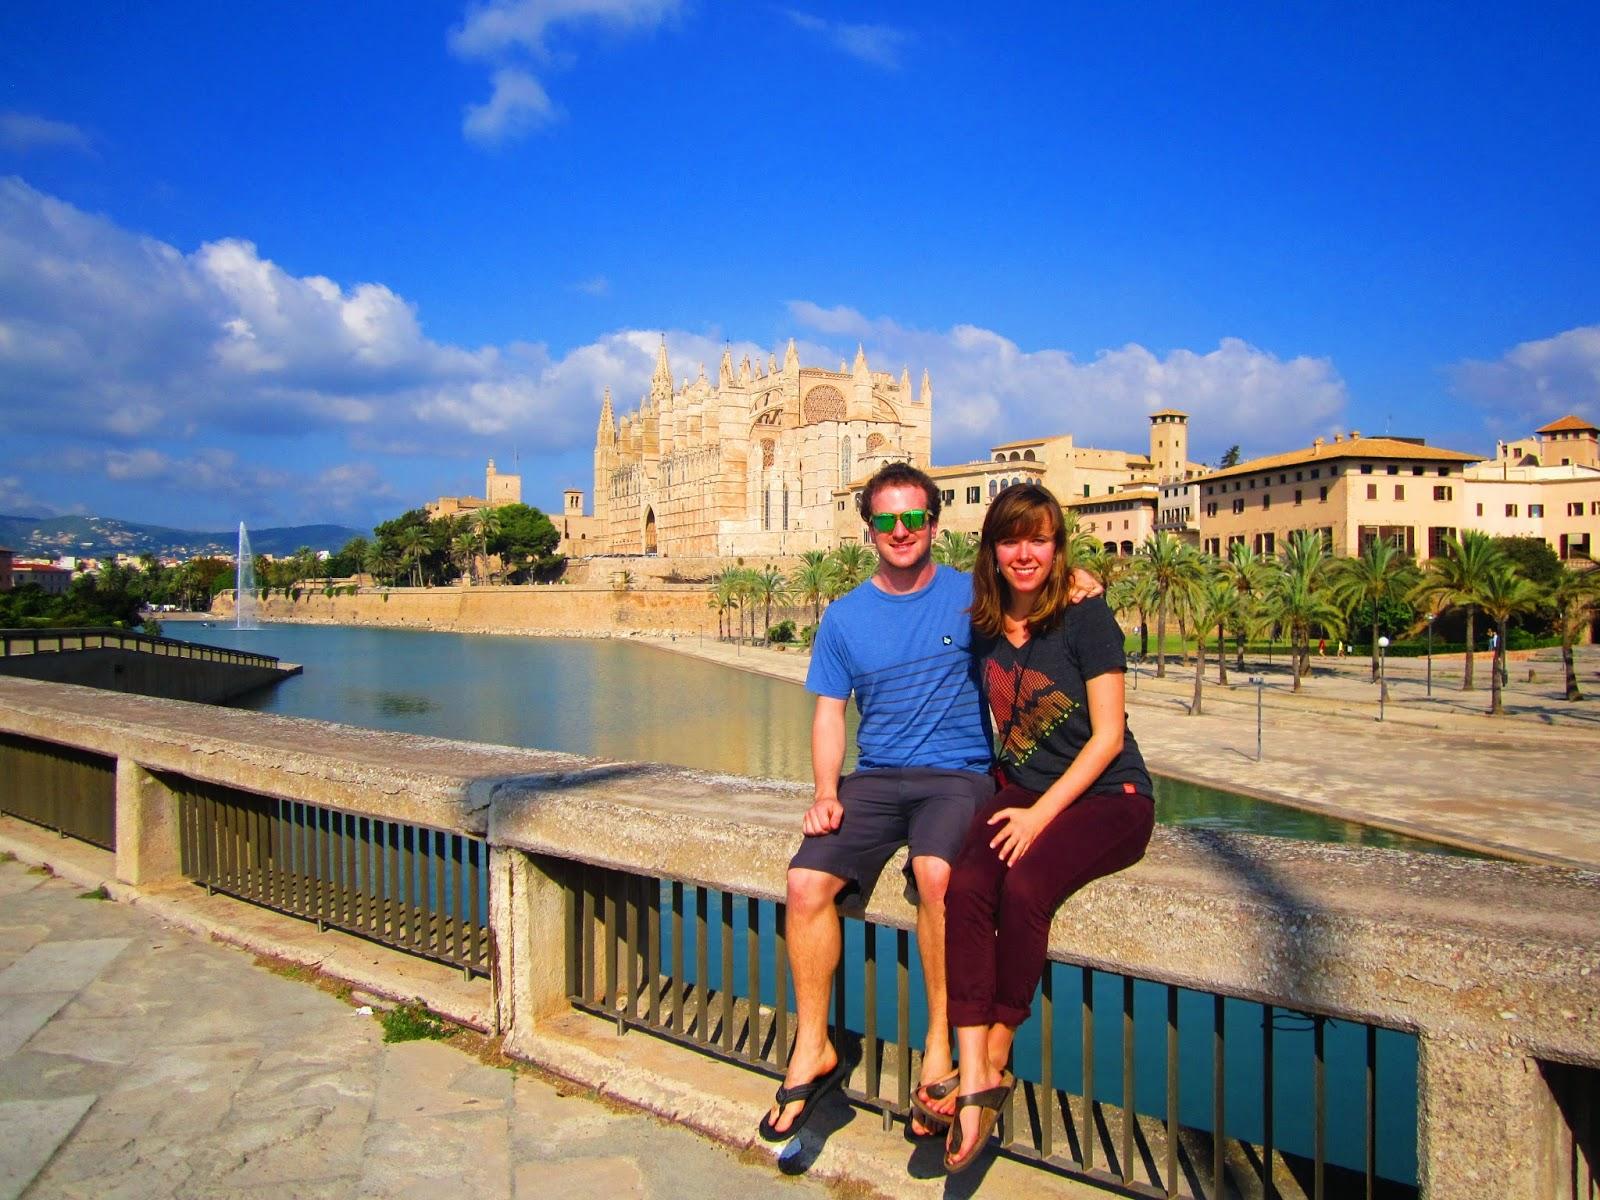 The last couple of weeks: Felsenmeer, Mallorca, Burg Frankenstein ...